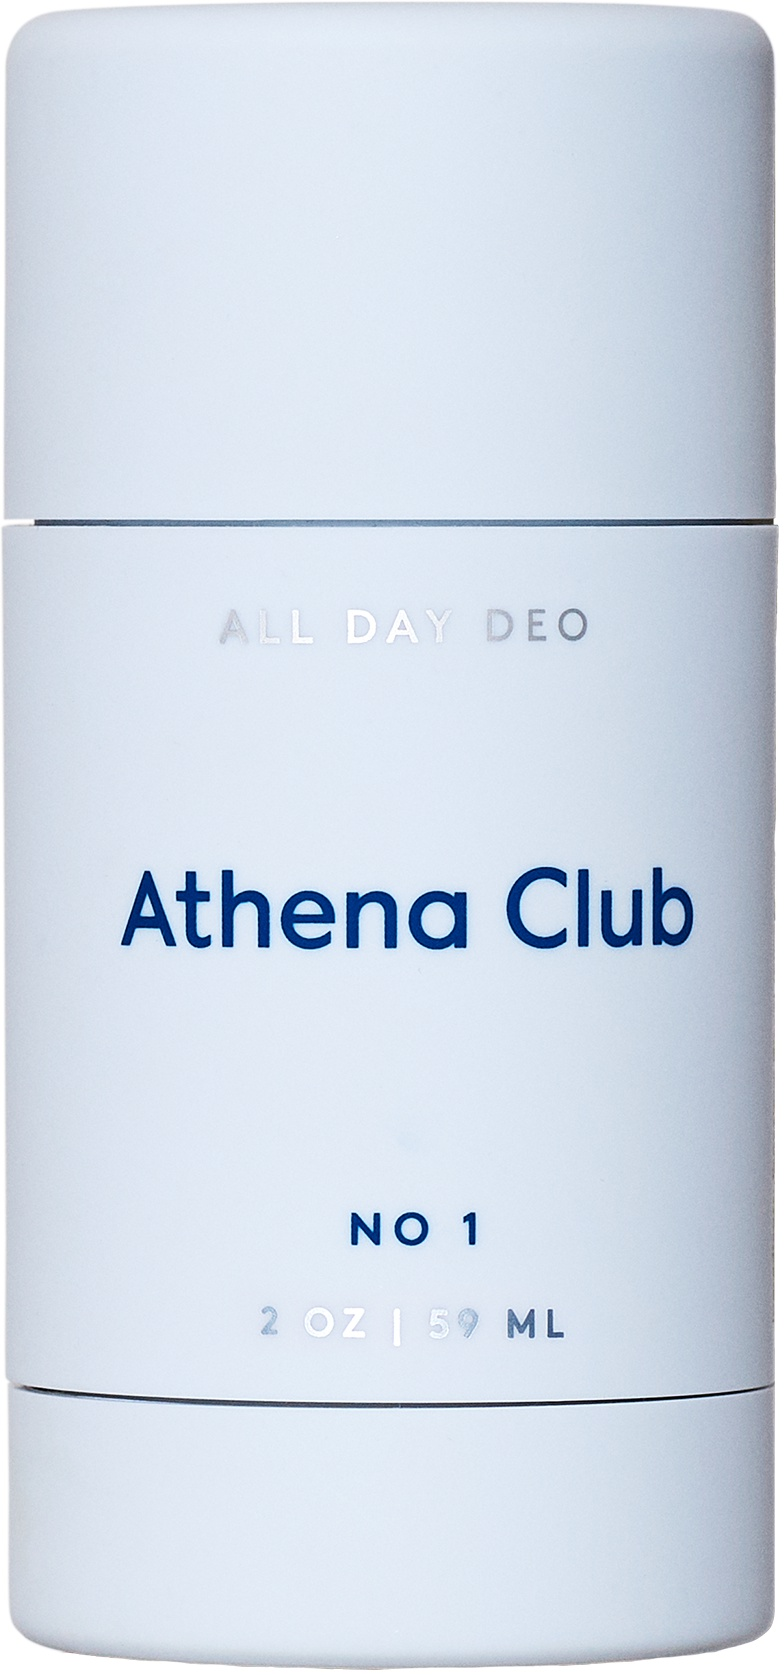 Athena Club All Day Deo Tropical Bergamot